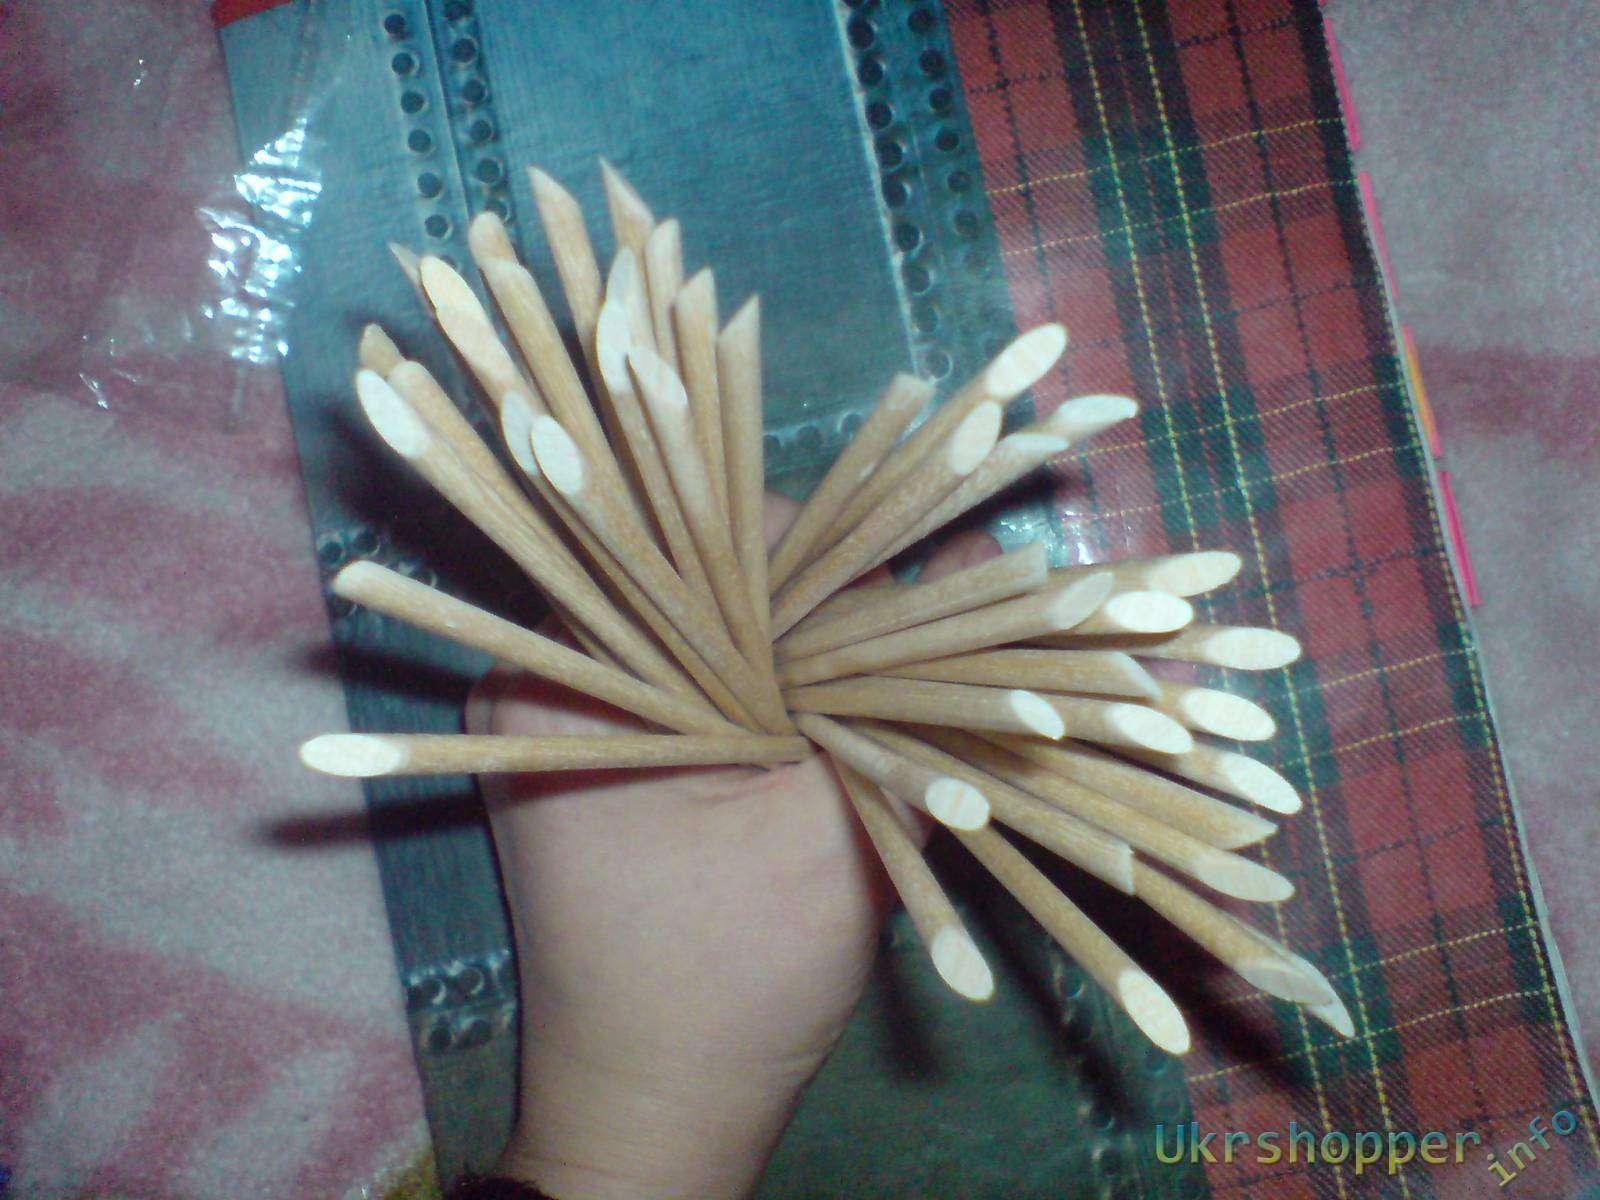 TinyDeal: Маникюрный набор  палочек. 15pcs Professional Nail Art Sticks Nail Care Tool Beauty Item Set for Ladies Girls HCI-162442